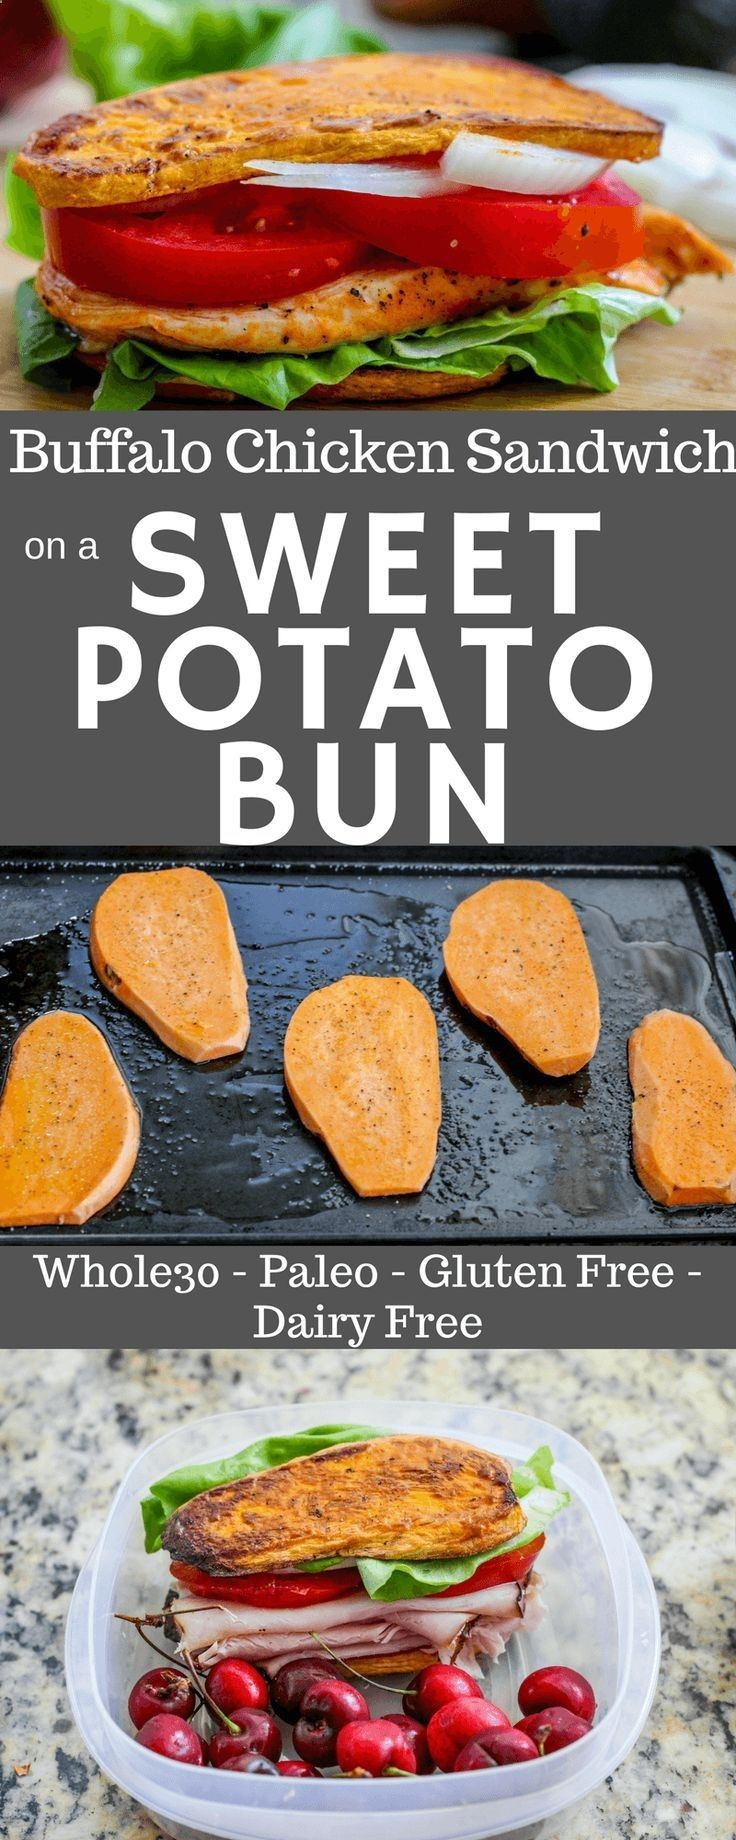 Paleo Whole30 buffalo chicken sandwich and paleo ranch on sweet potato buns! via @Allys Cooking